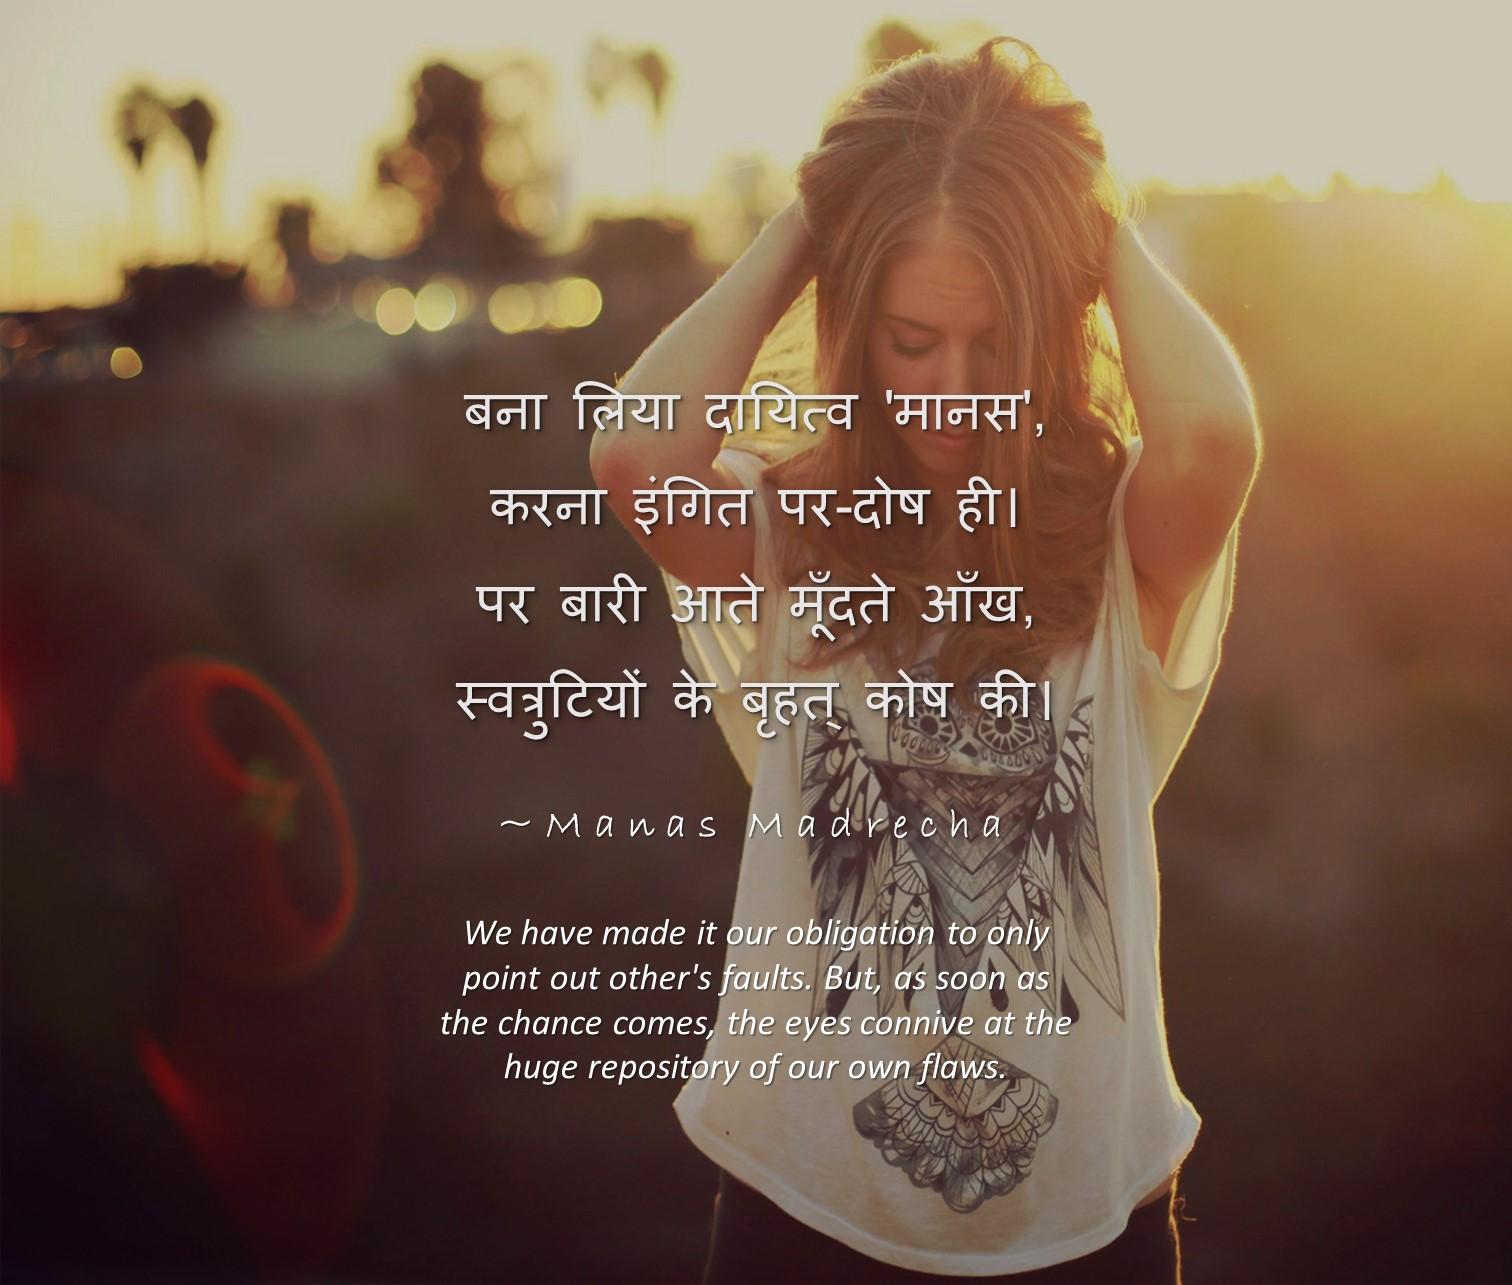 girl hands up, girl in sunshine, girl mood wallpaper, girl touching her hair, girl thinking, alone girl sunshine tumblr, sad girl thinking, happy girl thinking, girl bokeh effect, hot girl in sunshine, Manas Madrecha, Manas Madrecha blog, simplifying universe, hindi poem on self, hindi quotes, hindi shayari, inspirational poem, inspirational quotes, motivational quotes, first talk about yourself, pehle khud ki baat karo,